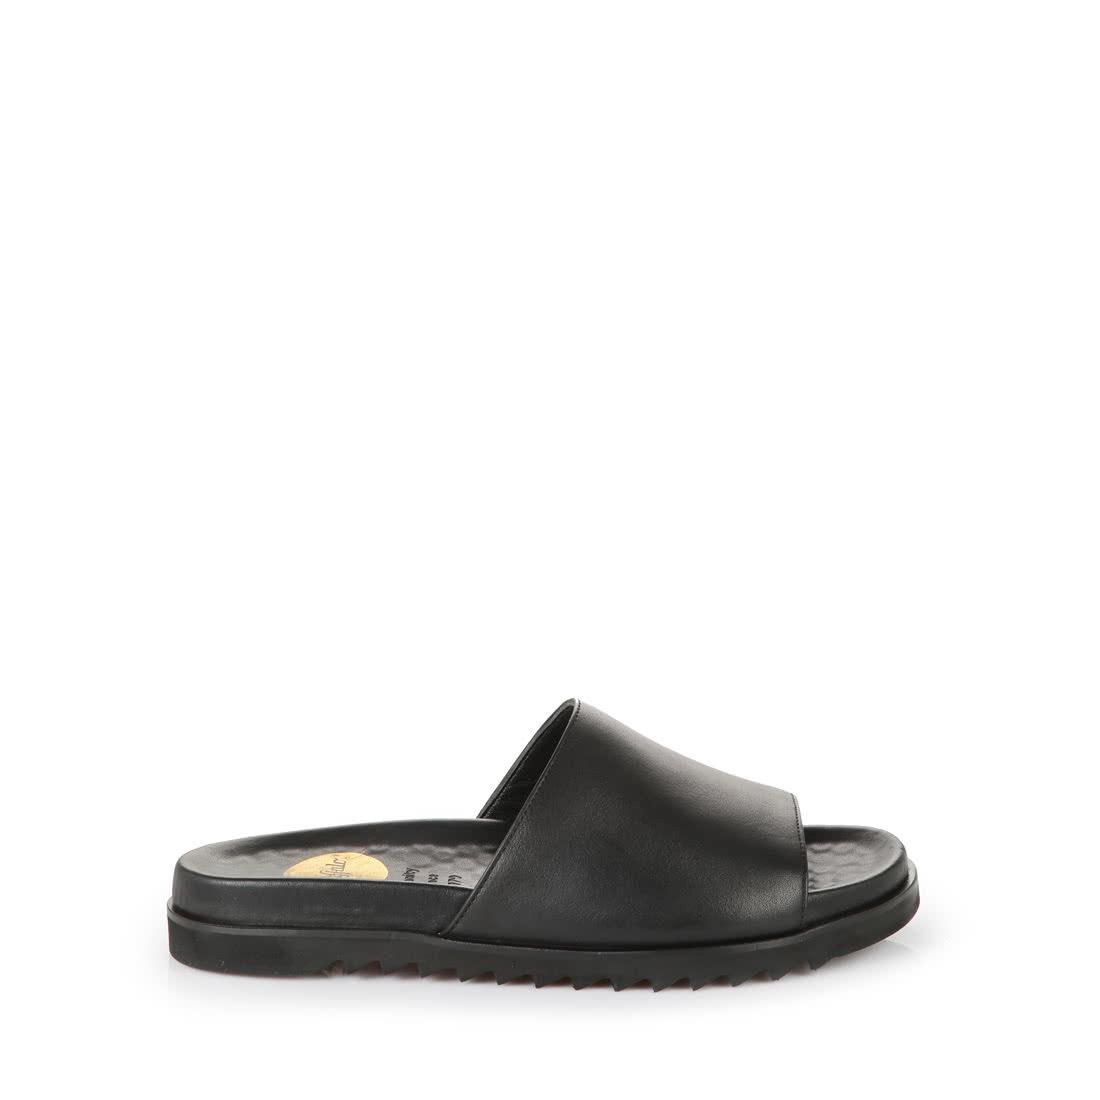 Buffalo Mens Leather Sandals In Black Buy Online Tendencies Footbed 2 Strap Brown 42